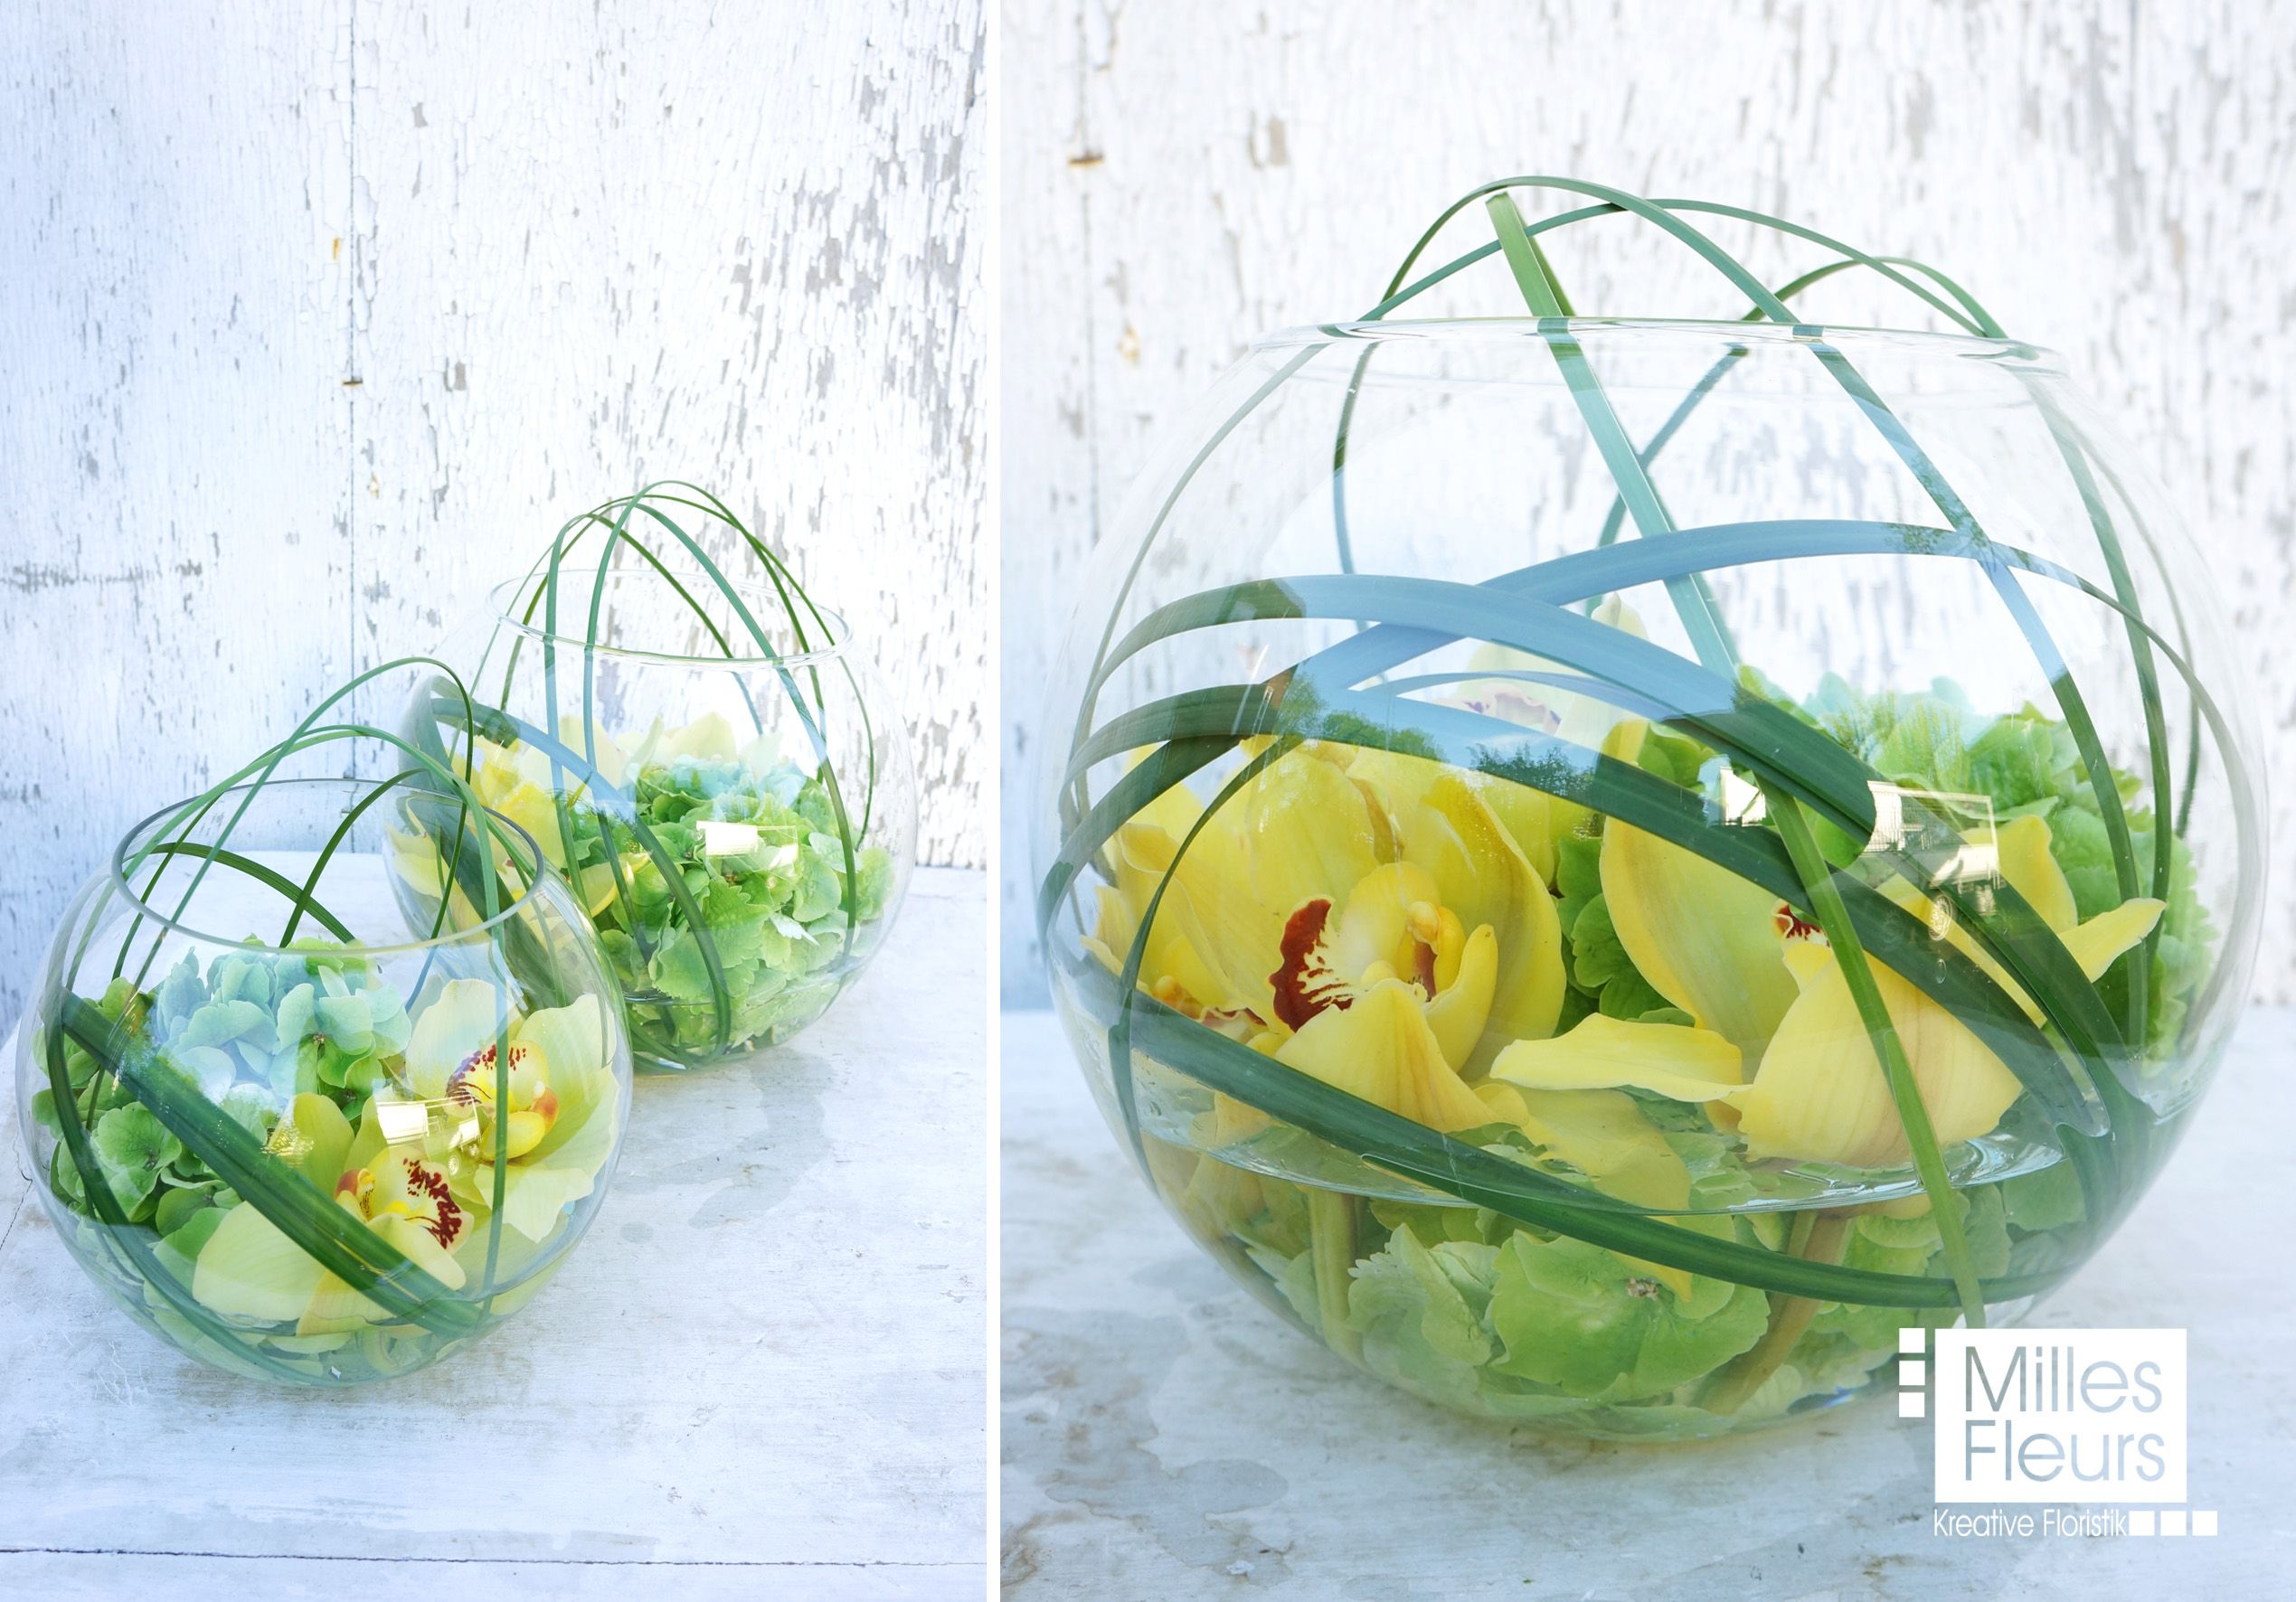 counter dekoration orchideen cymbidien kugelvase glas milles fleurs business pinterest. Black Bedroom Furniture Sets. Home Design Ideas